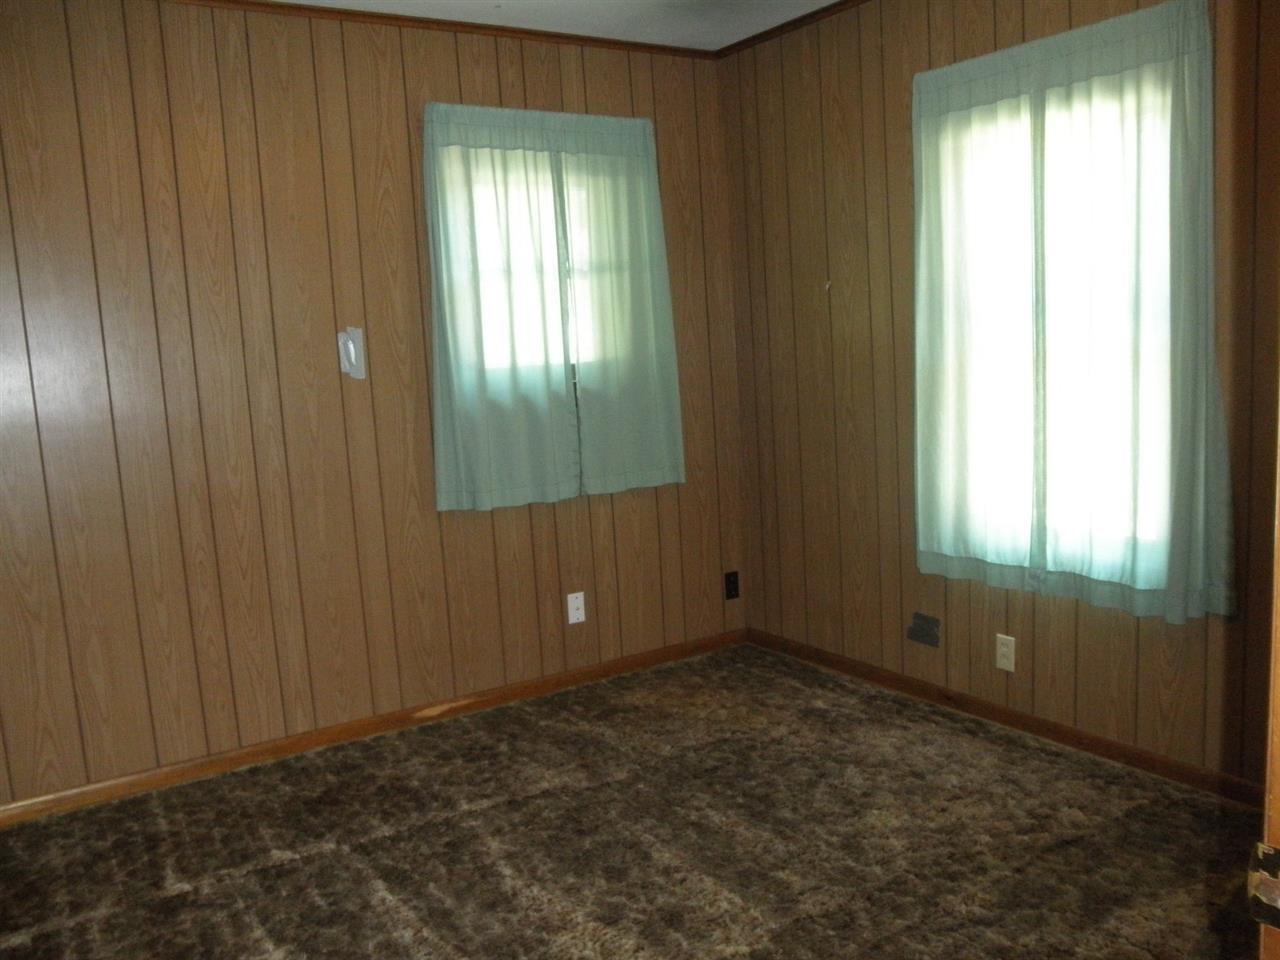 Sold Cross Sale W/ MLS | 916 E Cherry Ponca City, OK 74601 11